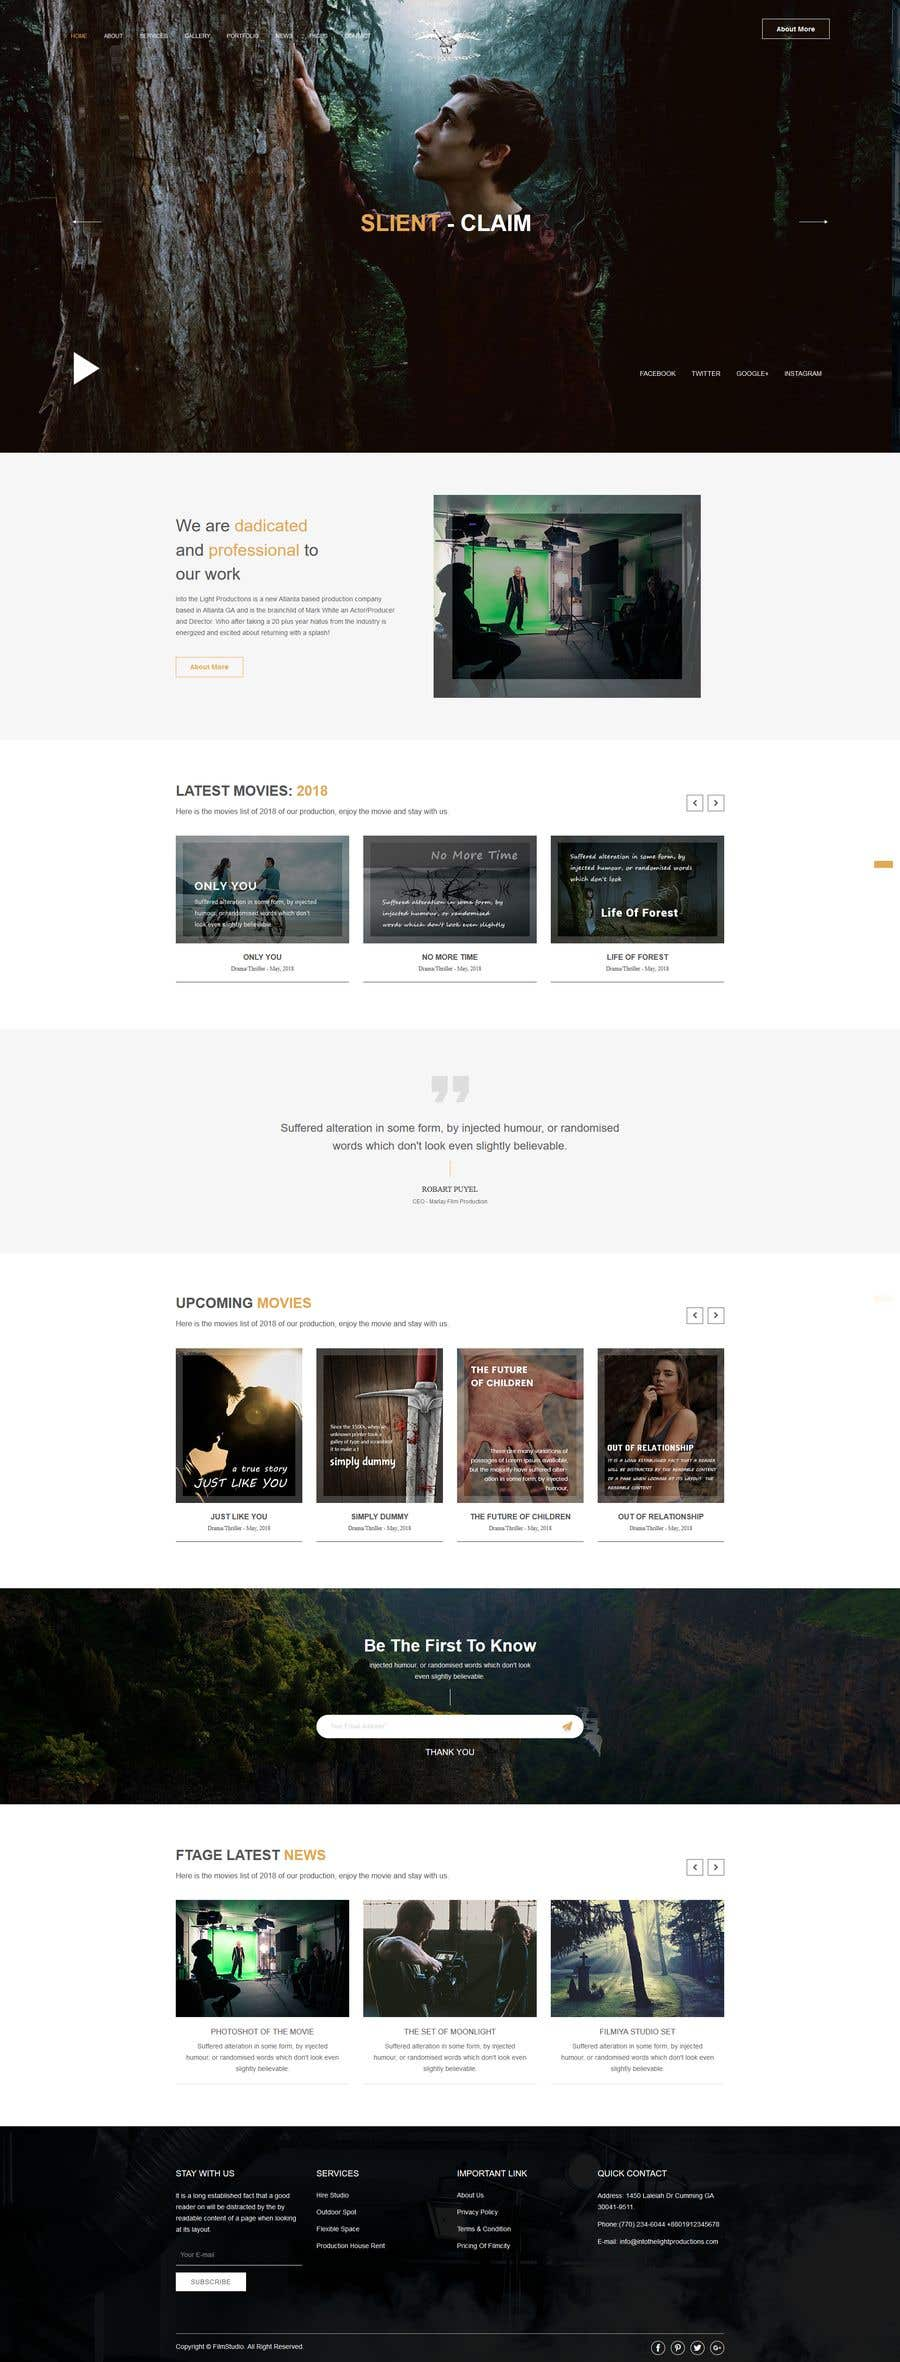 Penyertaan Peraduan #6 untuk Build a Beautiful Website